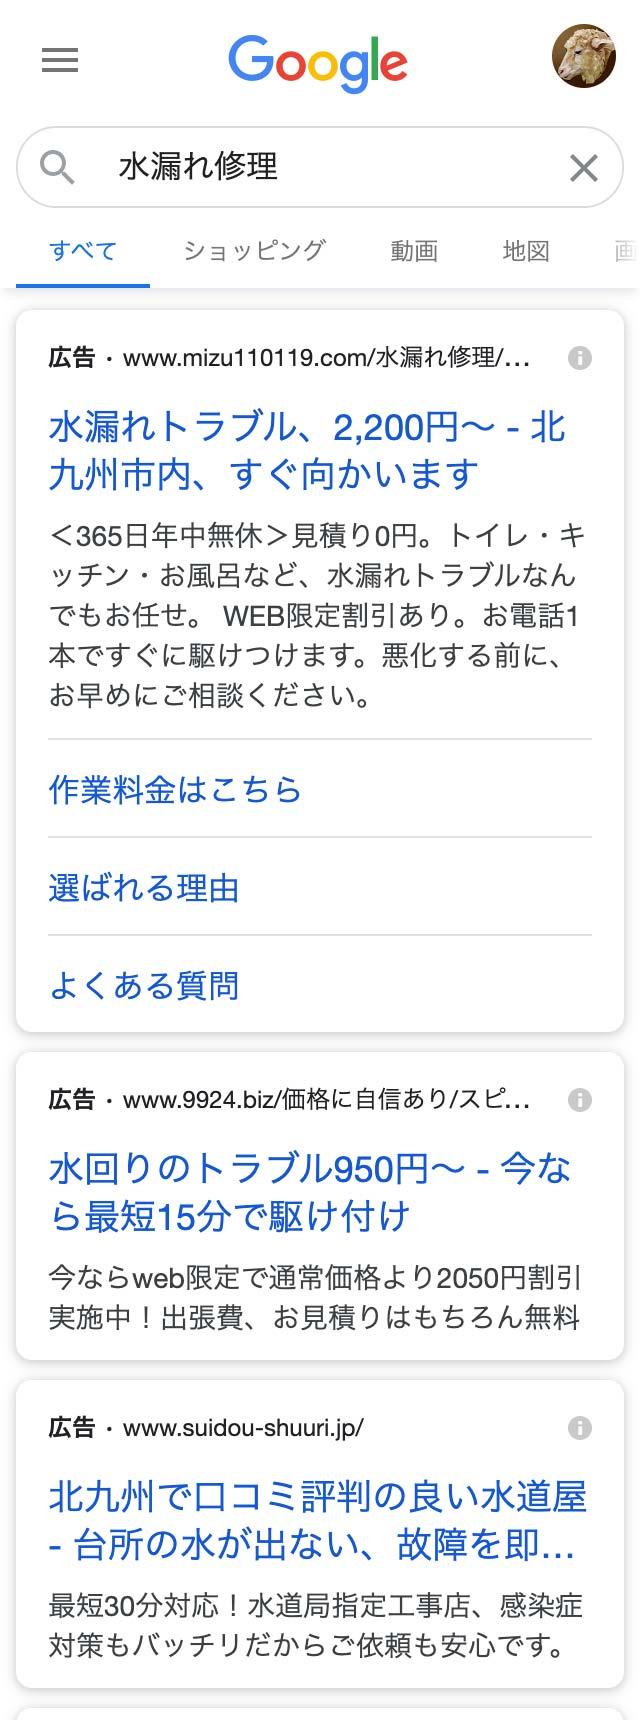 Google広告の見え方